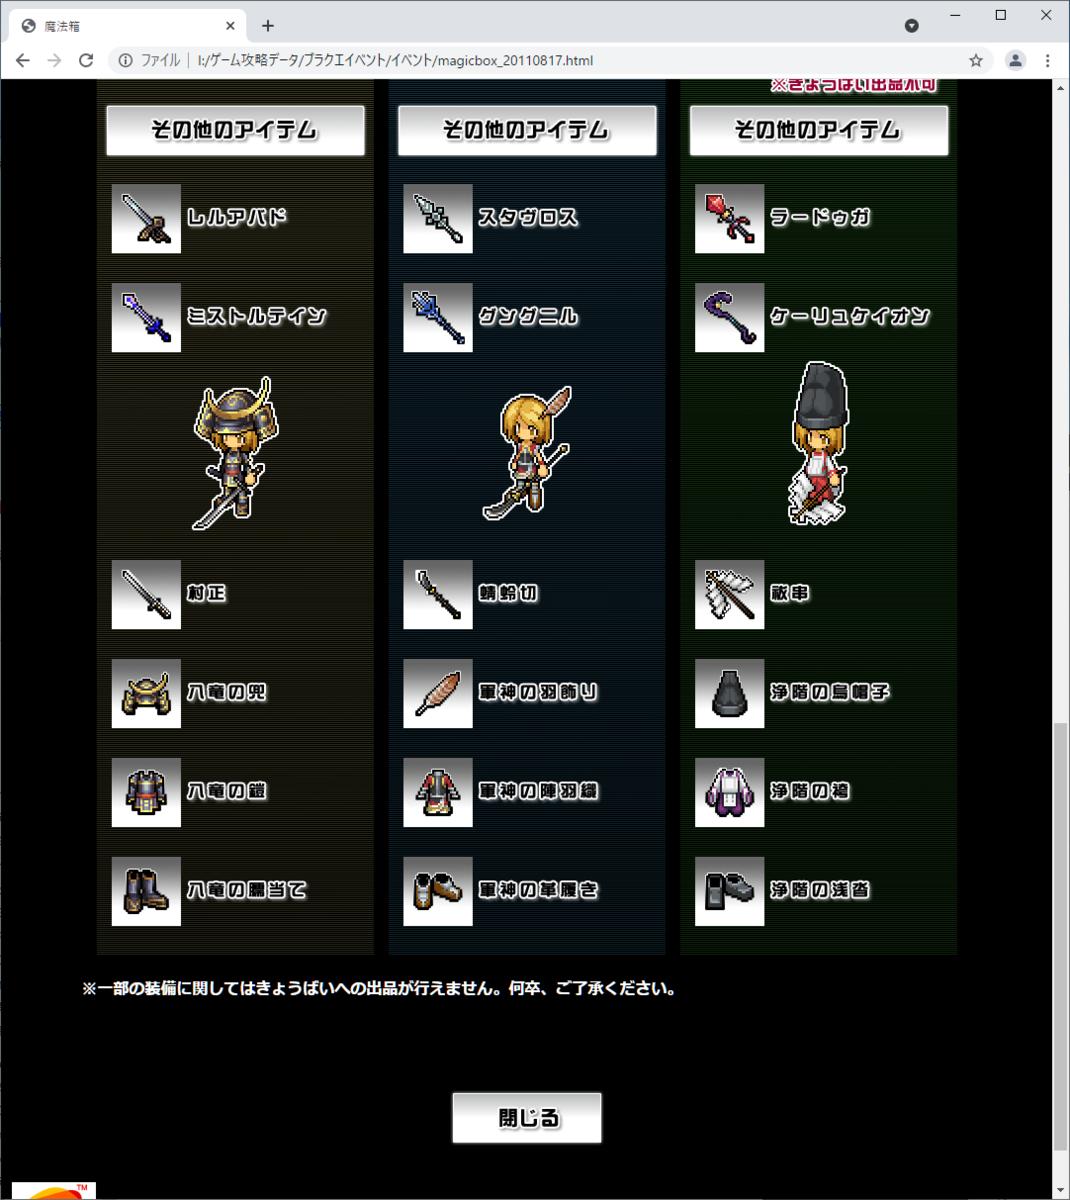 f:id:setoalpha:20210509153542p:plain